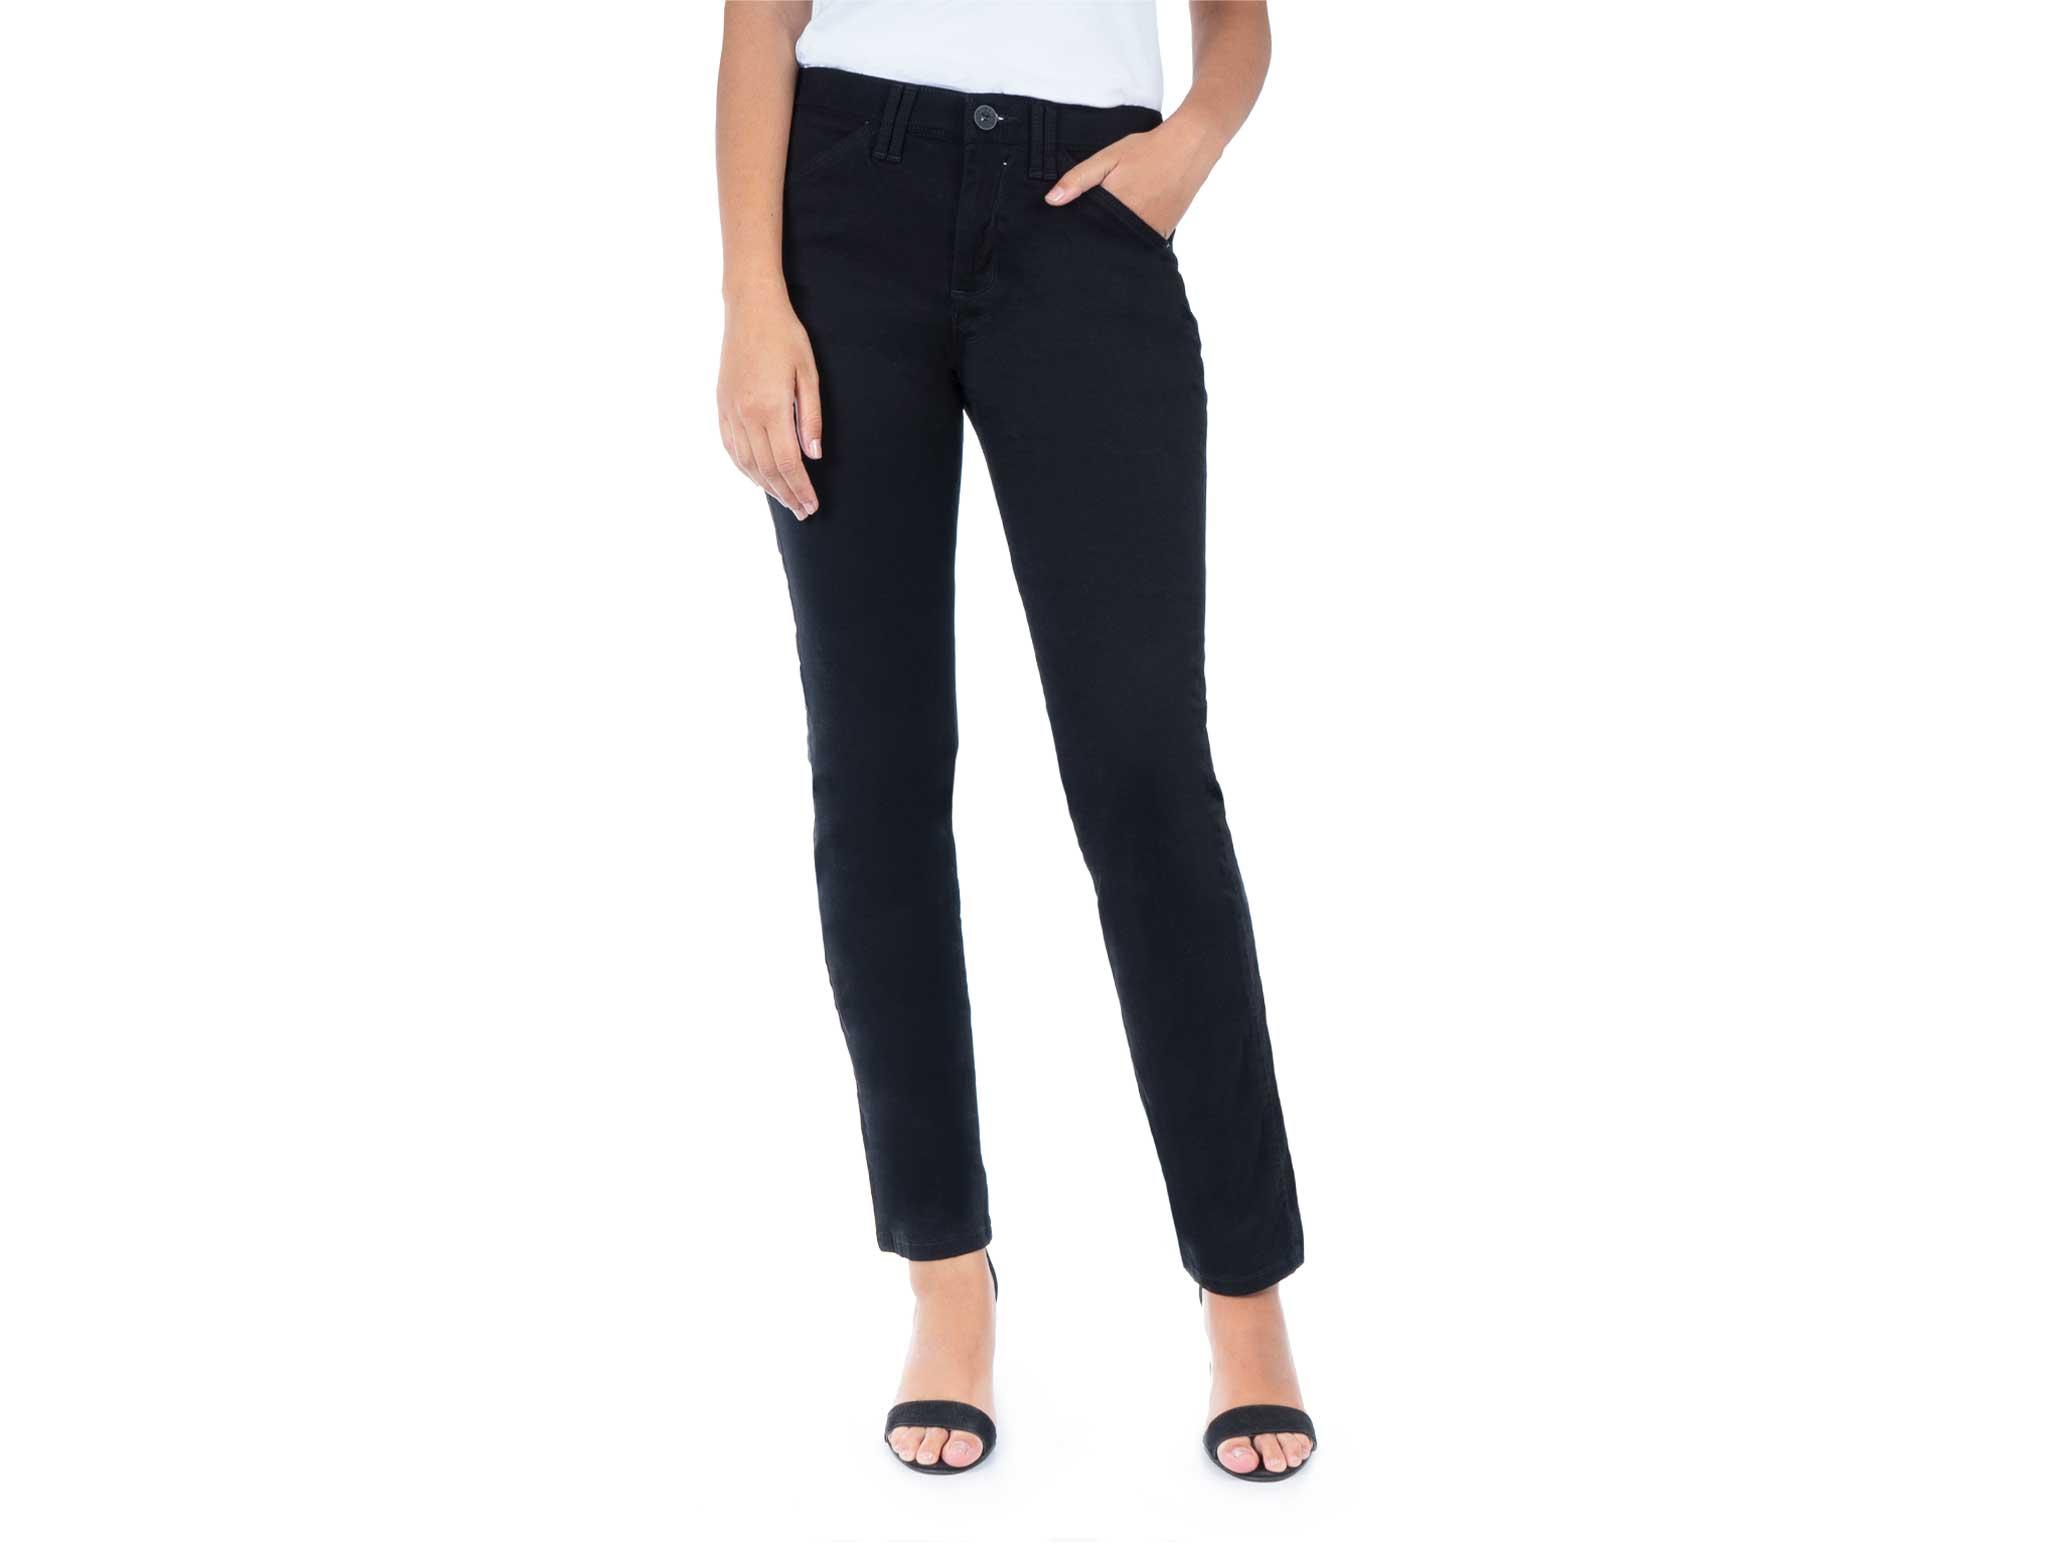 Pantalon Lee Casual Sport Gabardina Para Mujer 63 533 Ha 01 Surtidoradepartamental